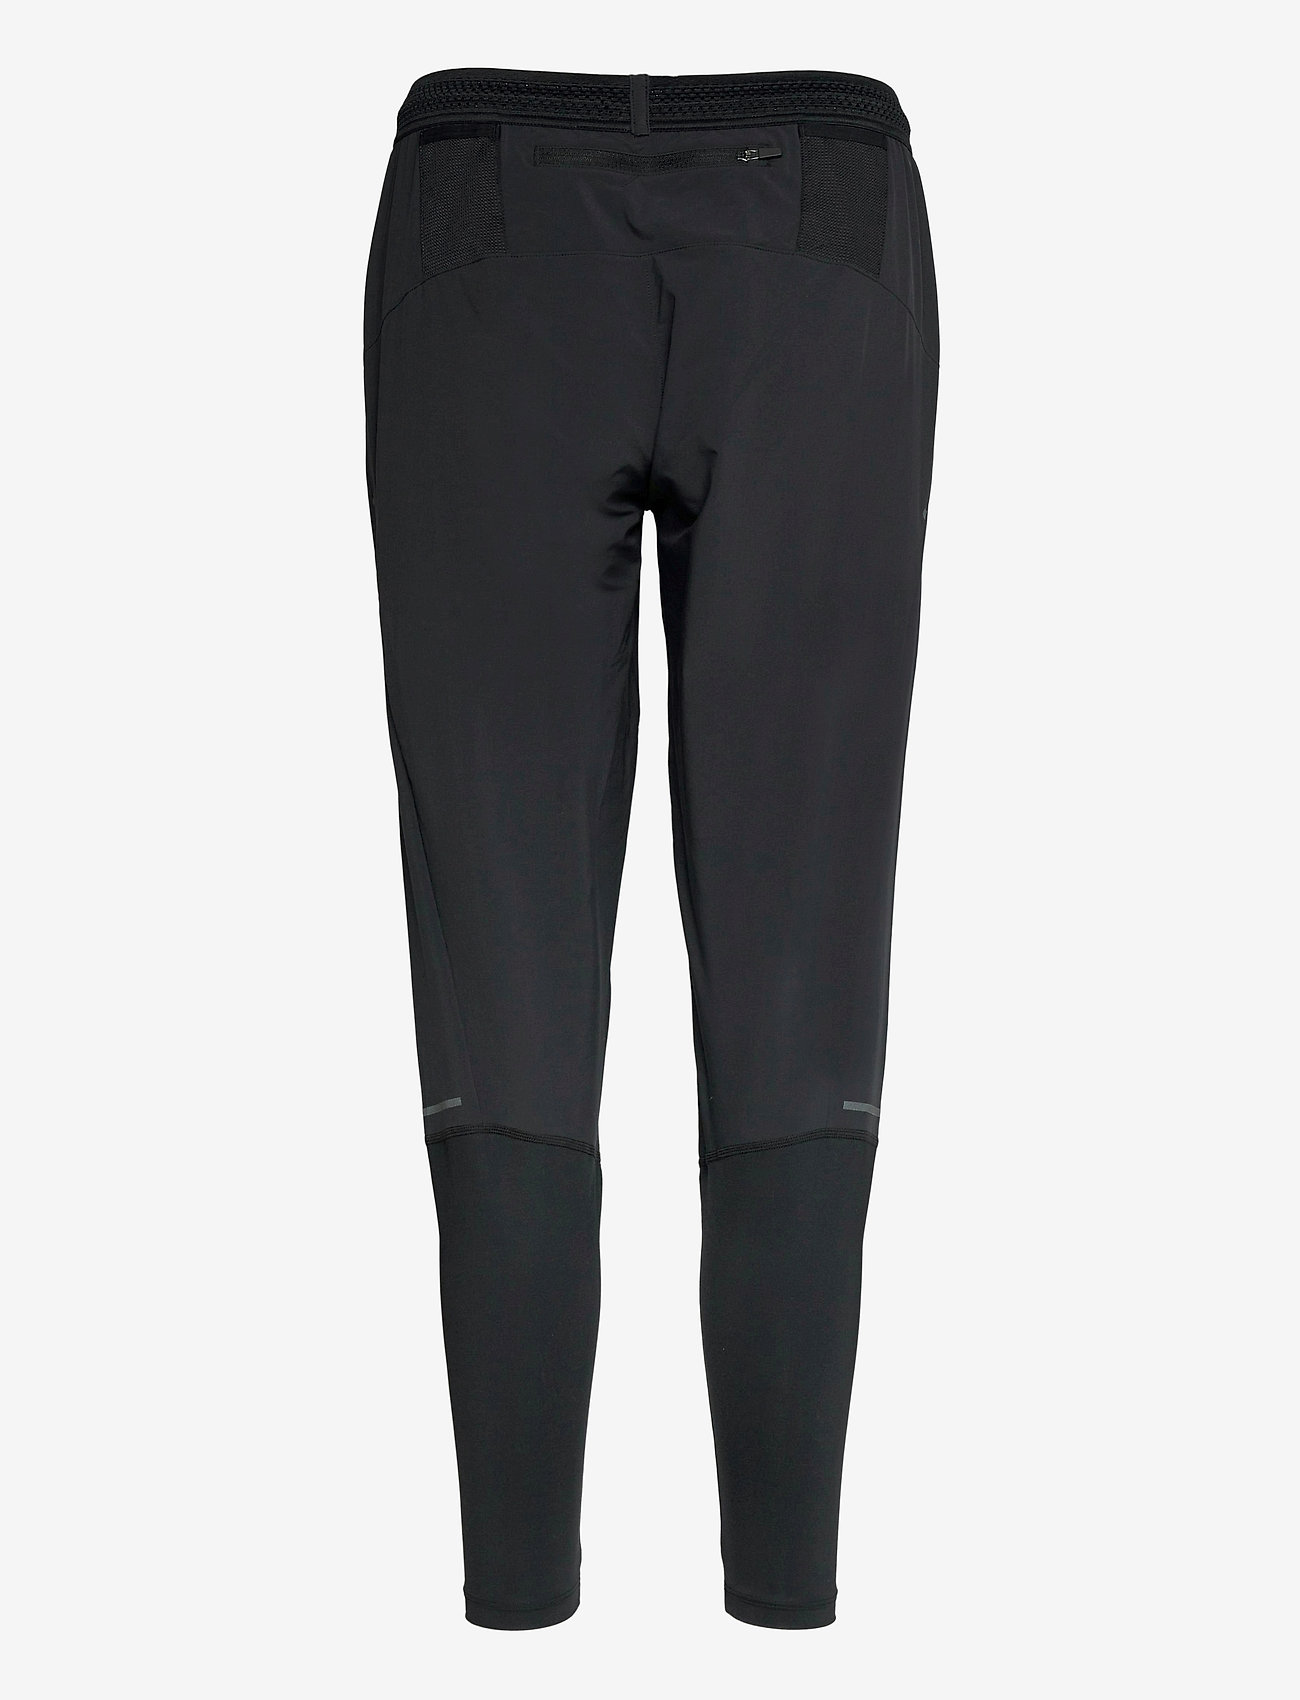 2XU - LIGHT SPEED JOGGER - sportbroeken - black/ black reflective - 1